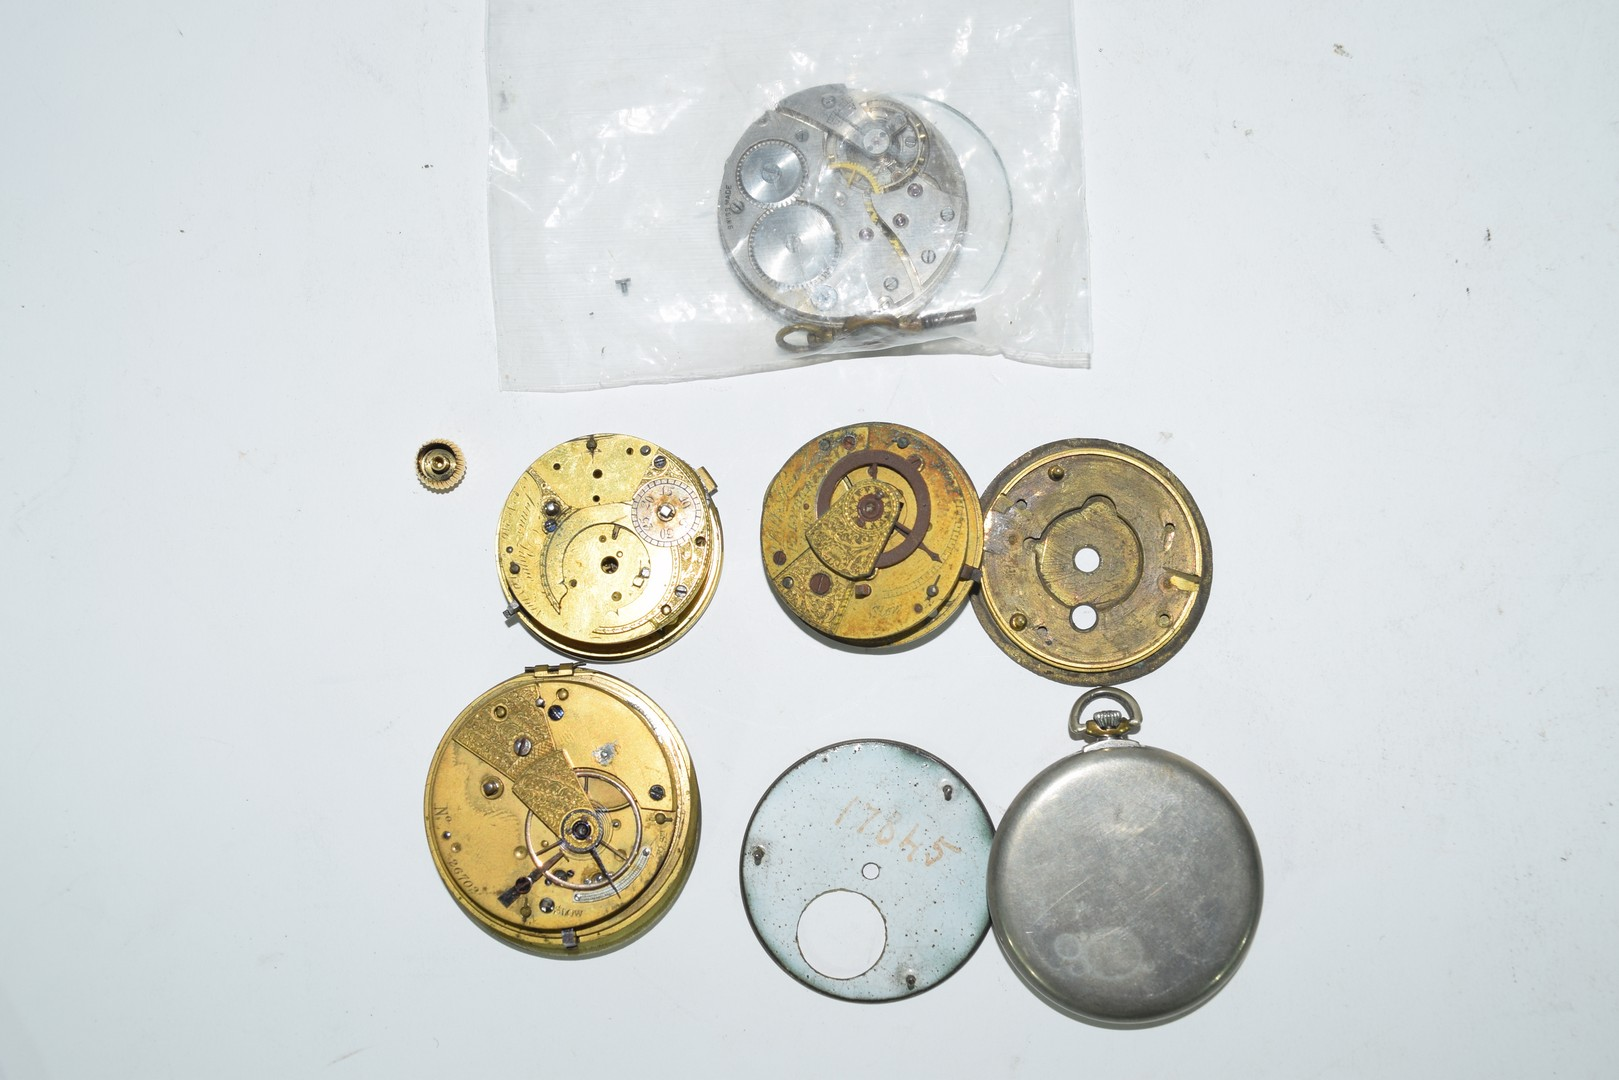 Mixed lot various pocket watches - Image 2 of 2